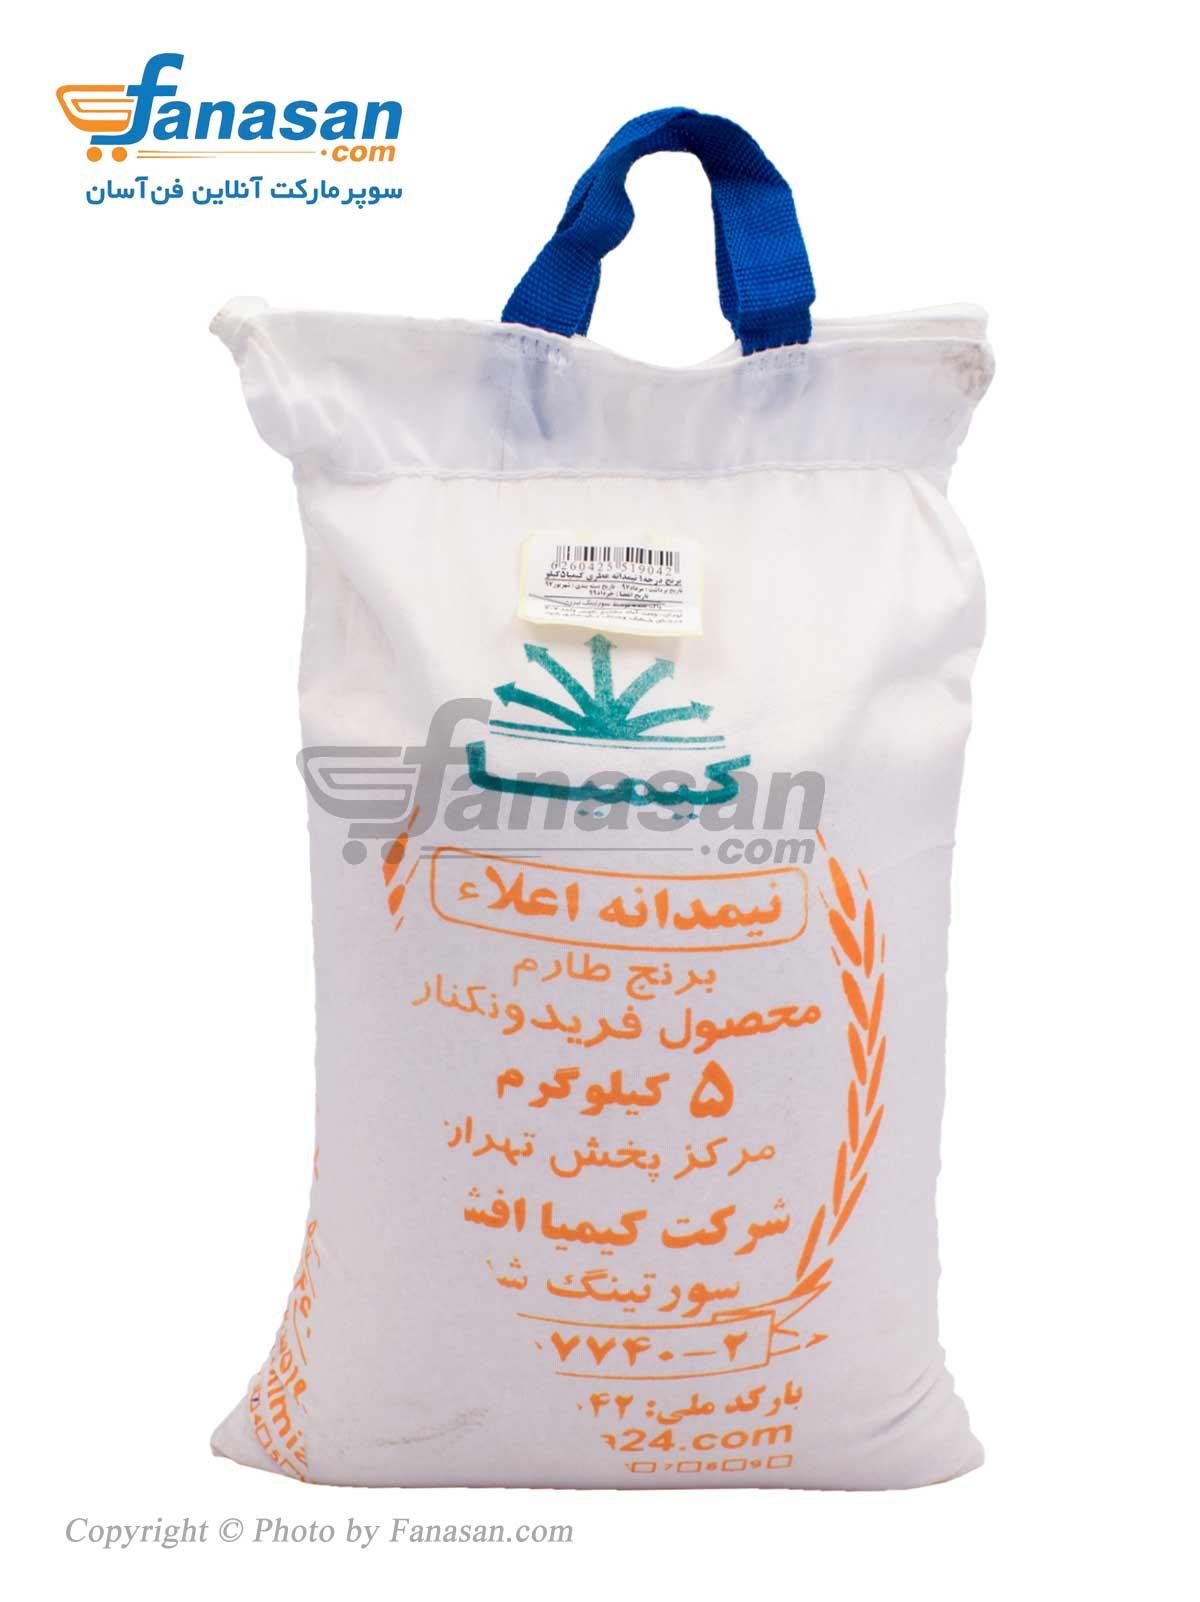 برنج طارم نیمدانه اعلاء کیمیا محصول فریدون کنار 5 کیلوگرم